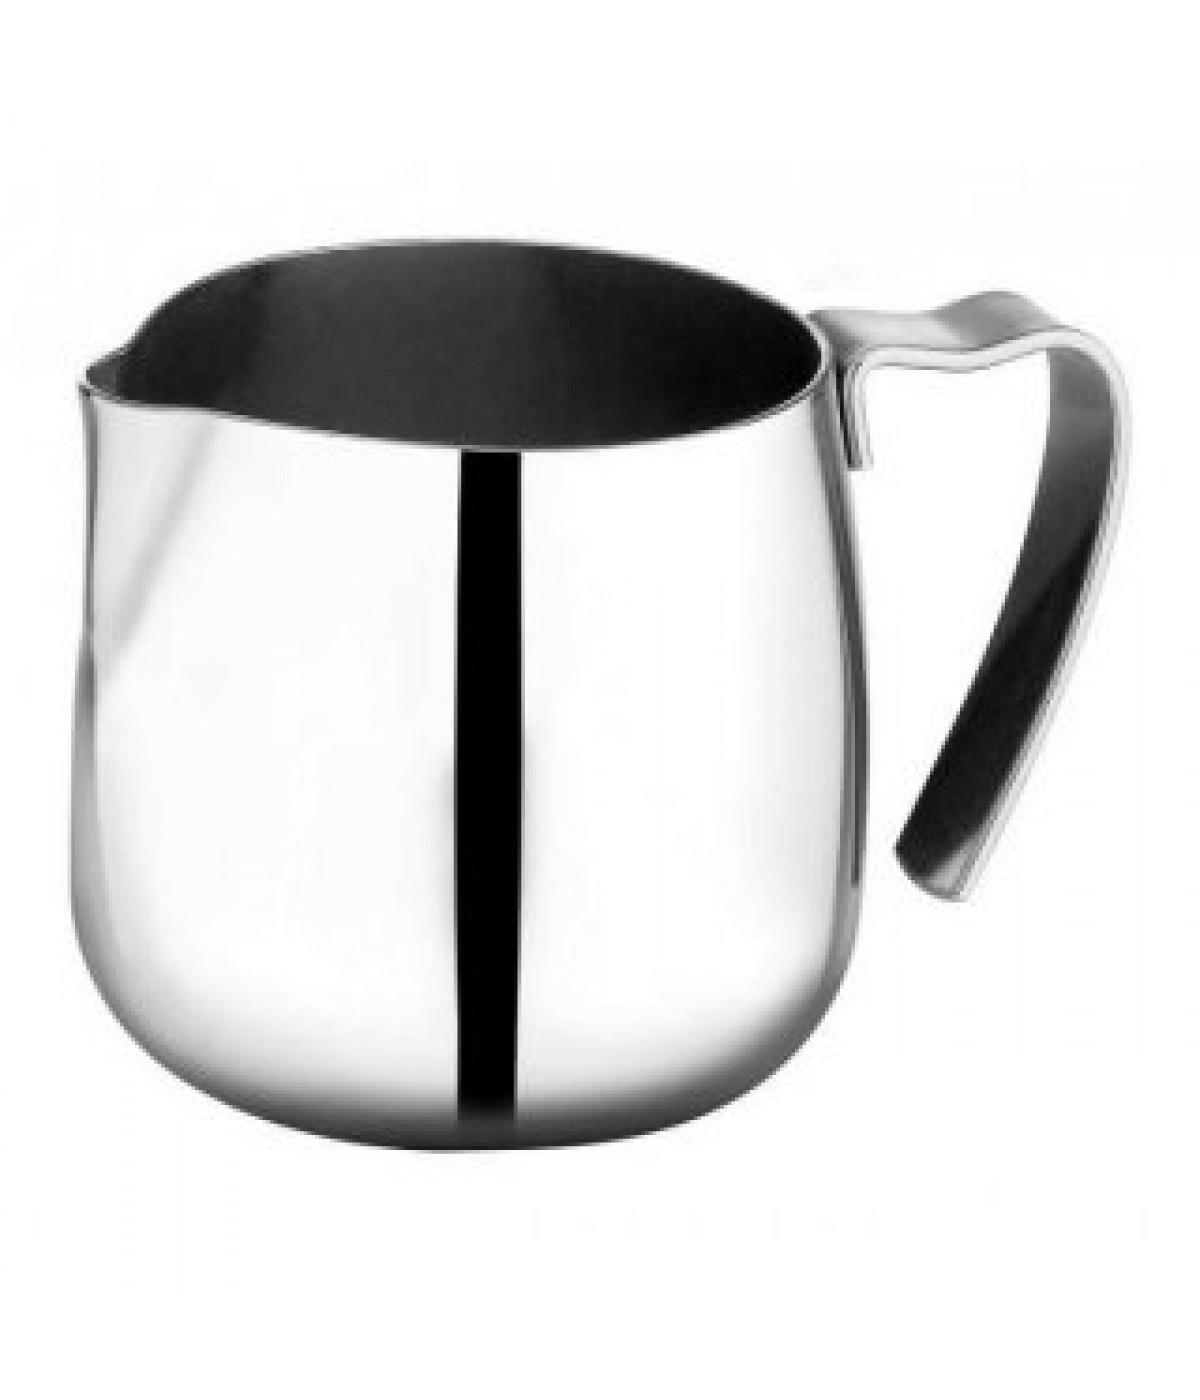 Milk jug 70 ml - Motta